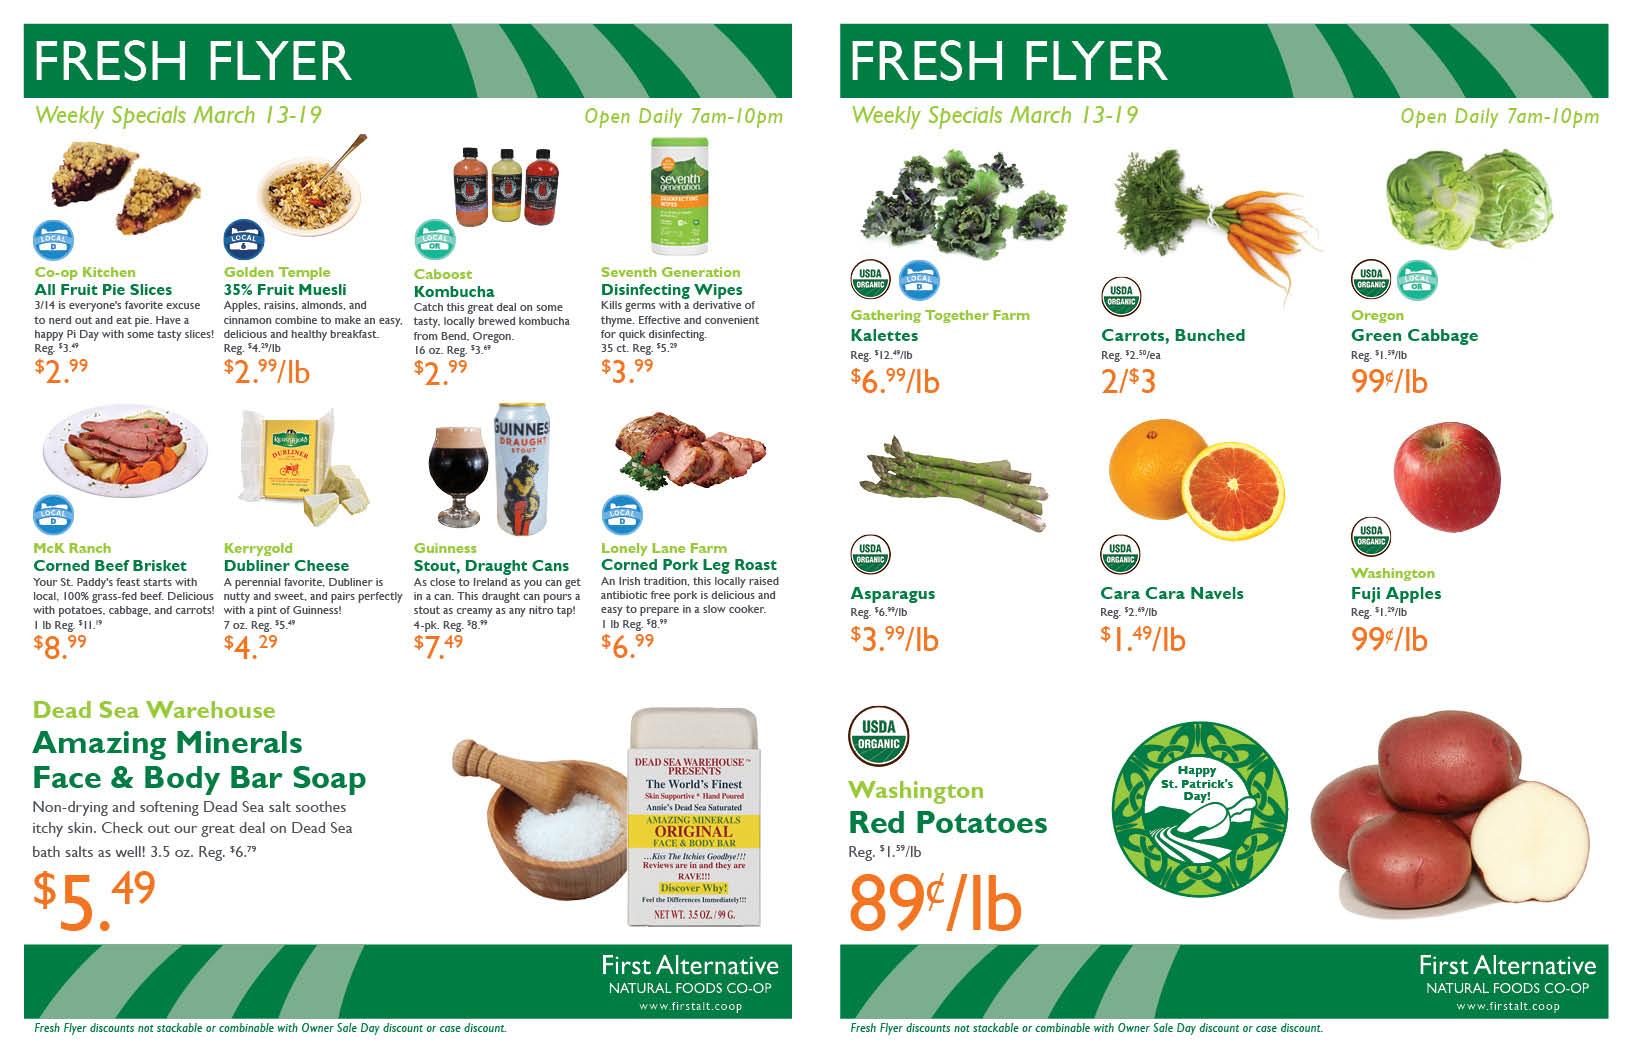 First Alternative Co-op Fresh Flyer March 13-19